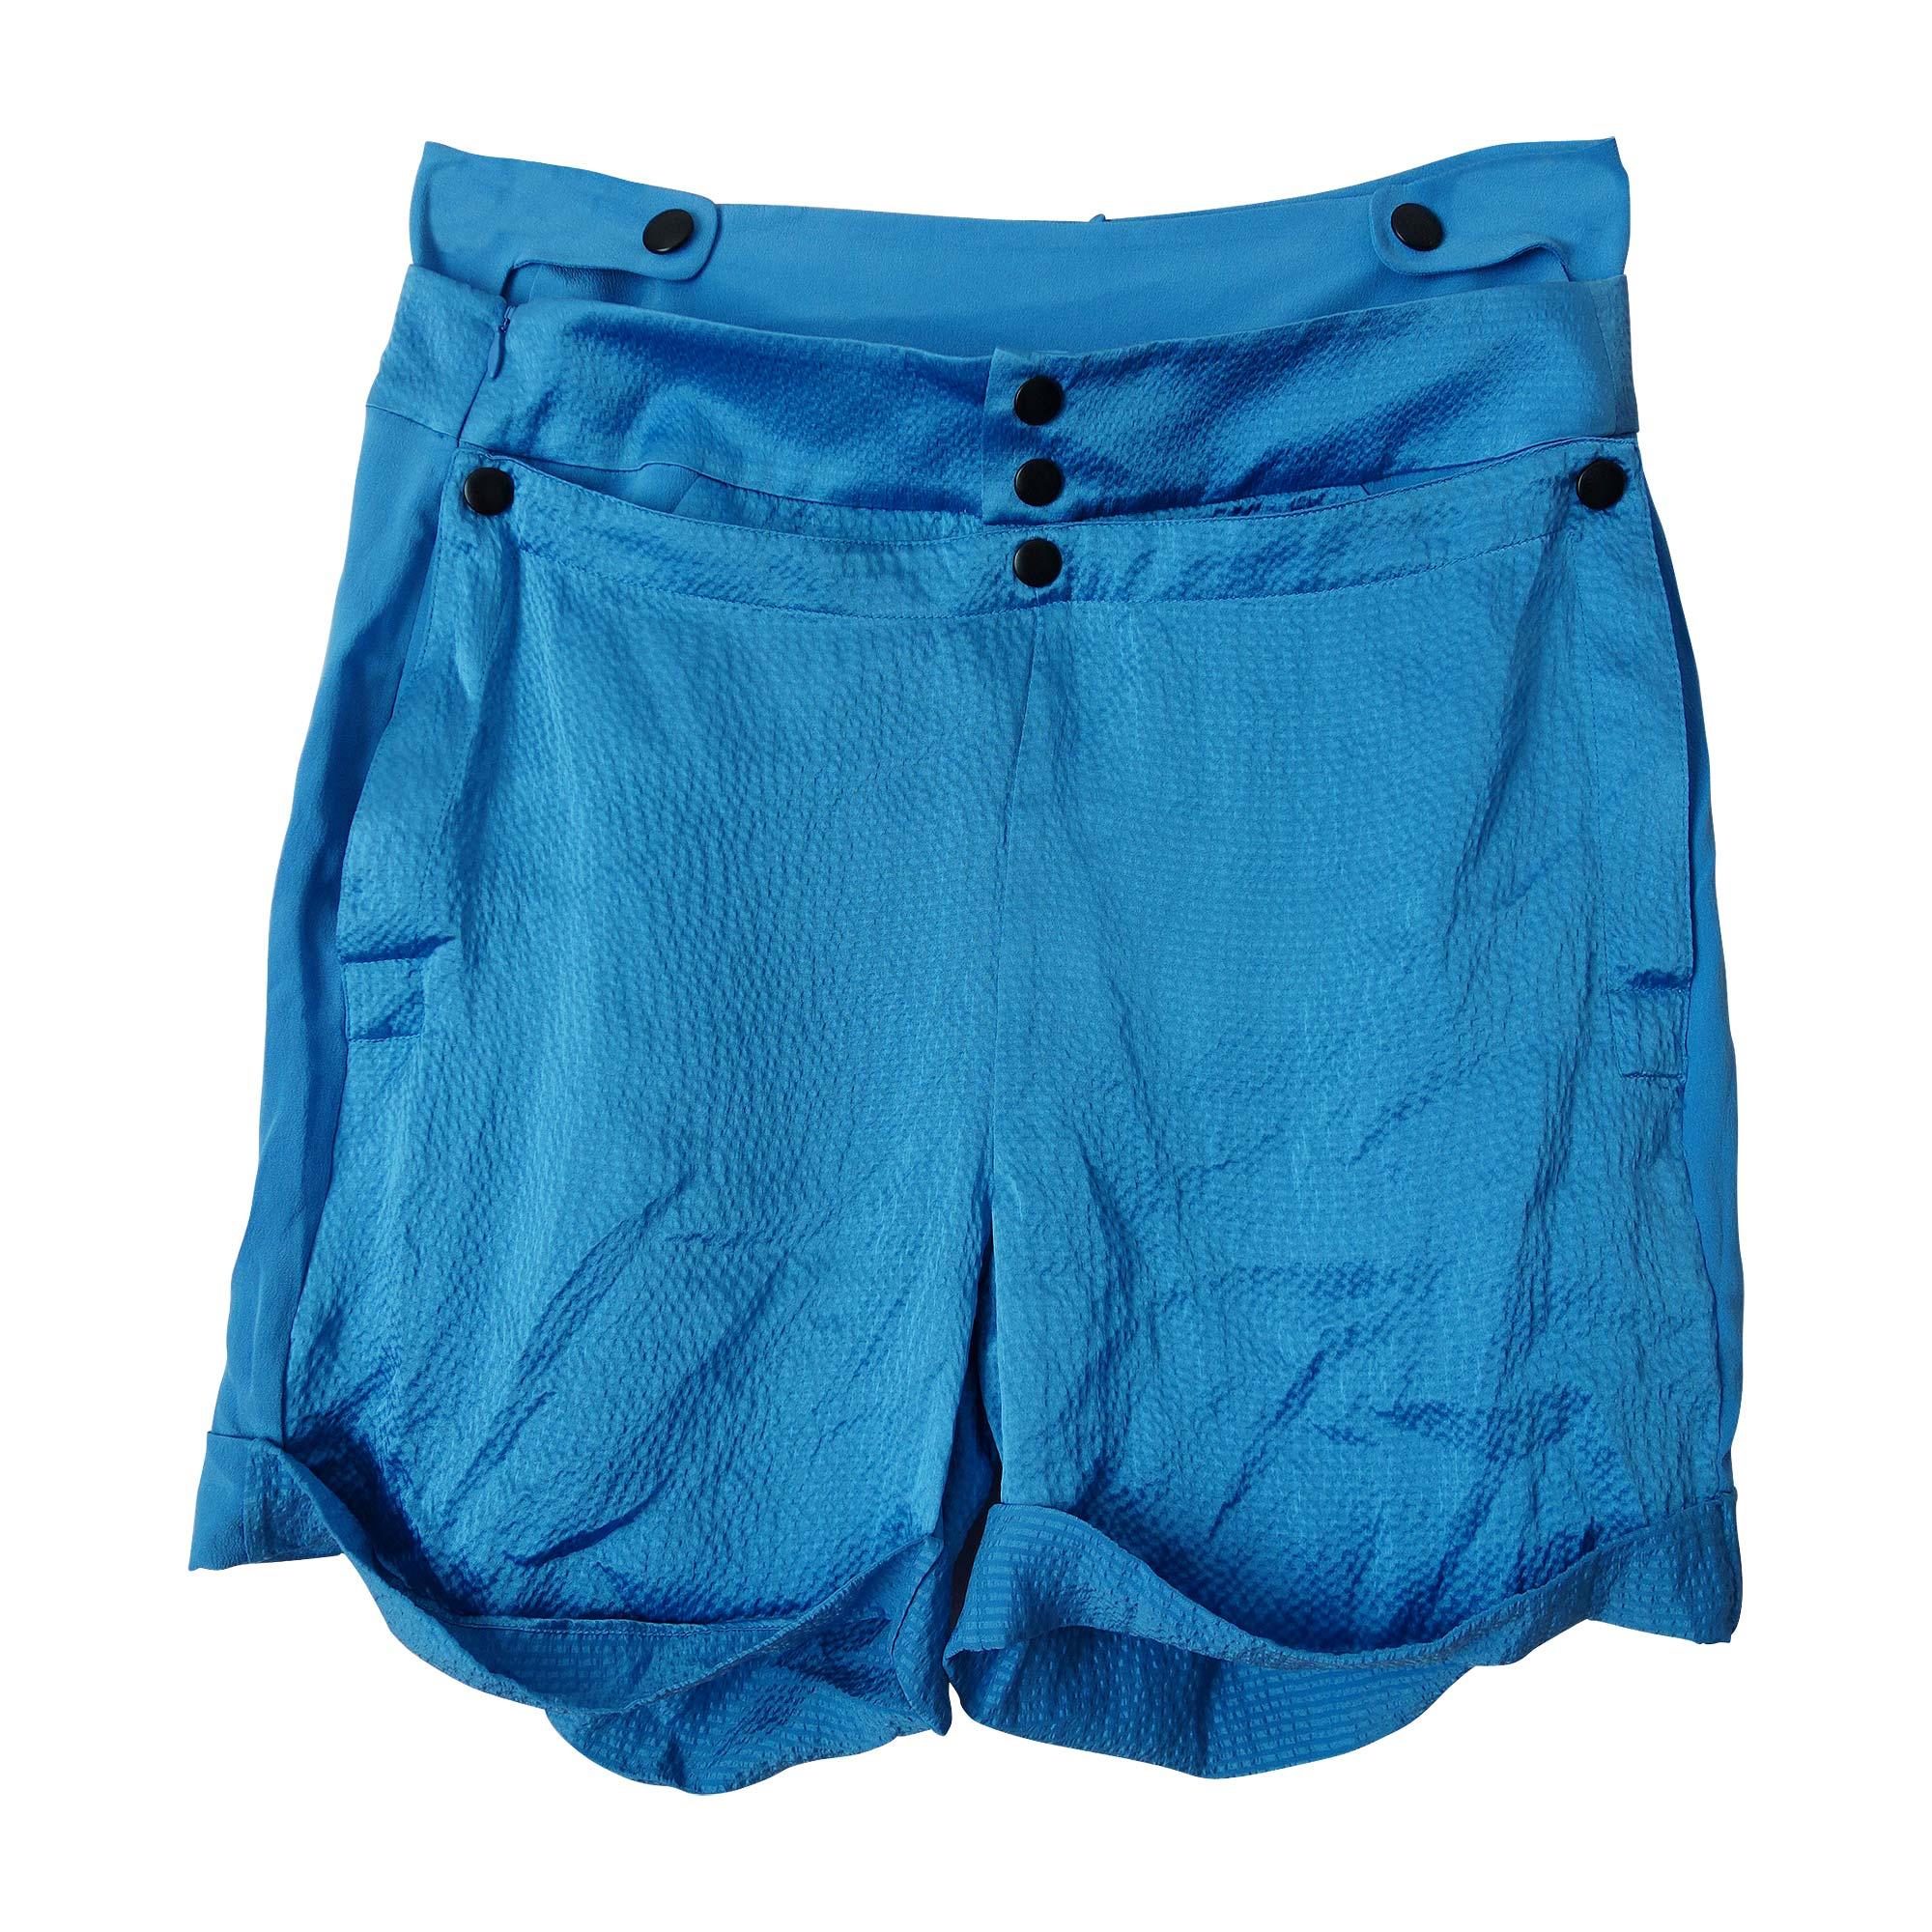 Short BALENCIAGA Bleu, bleu marine, bleu turquoise